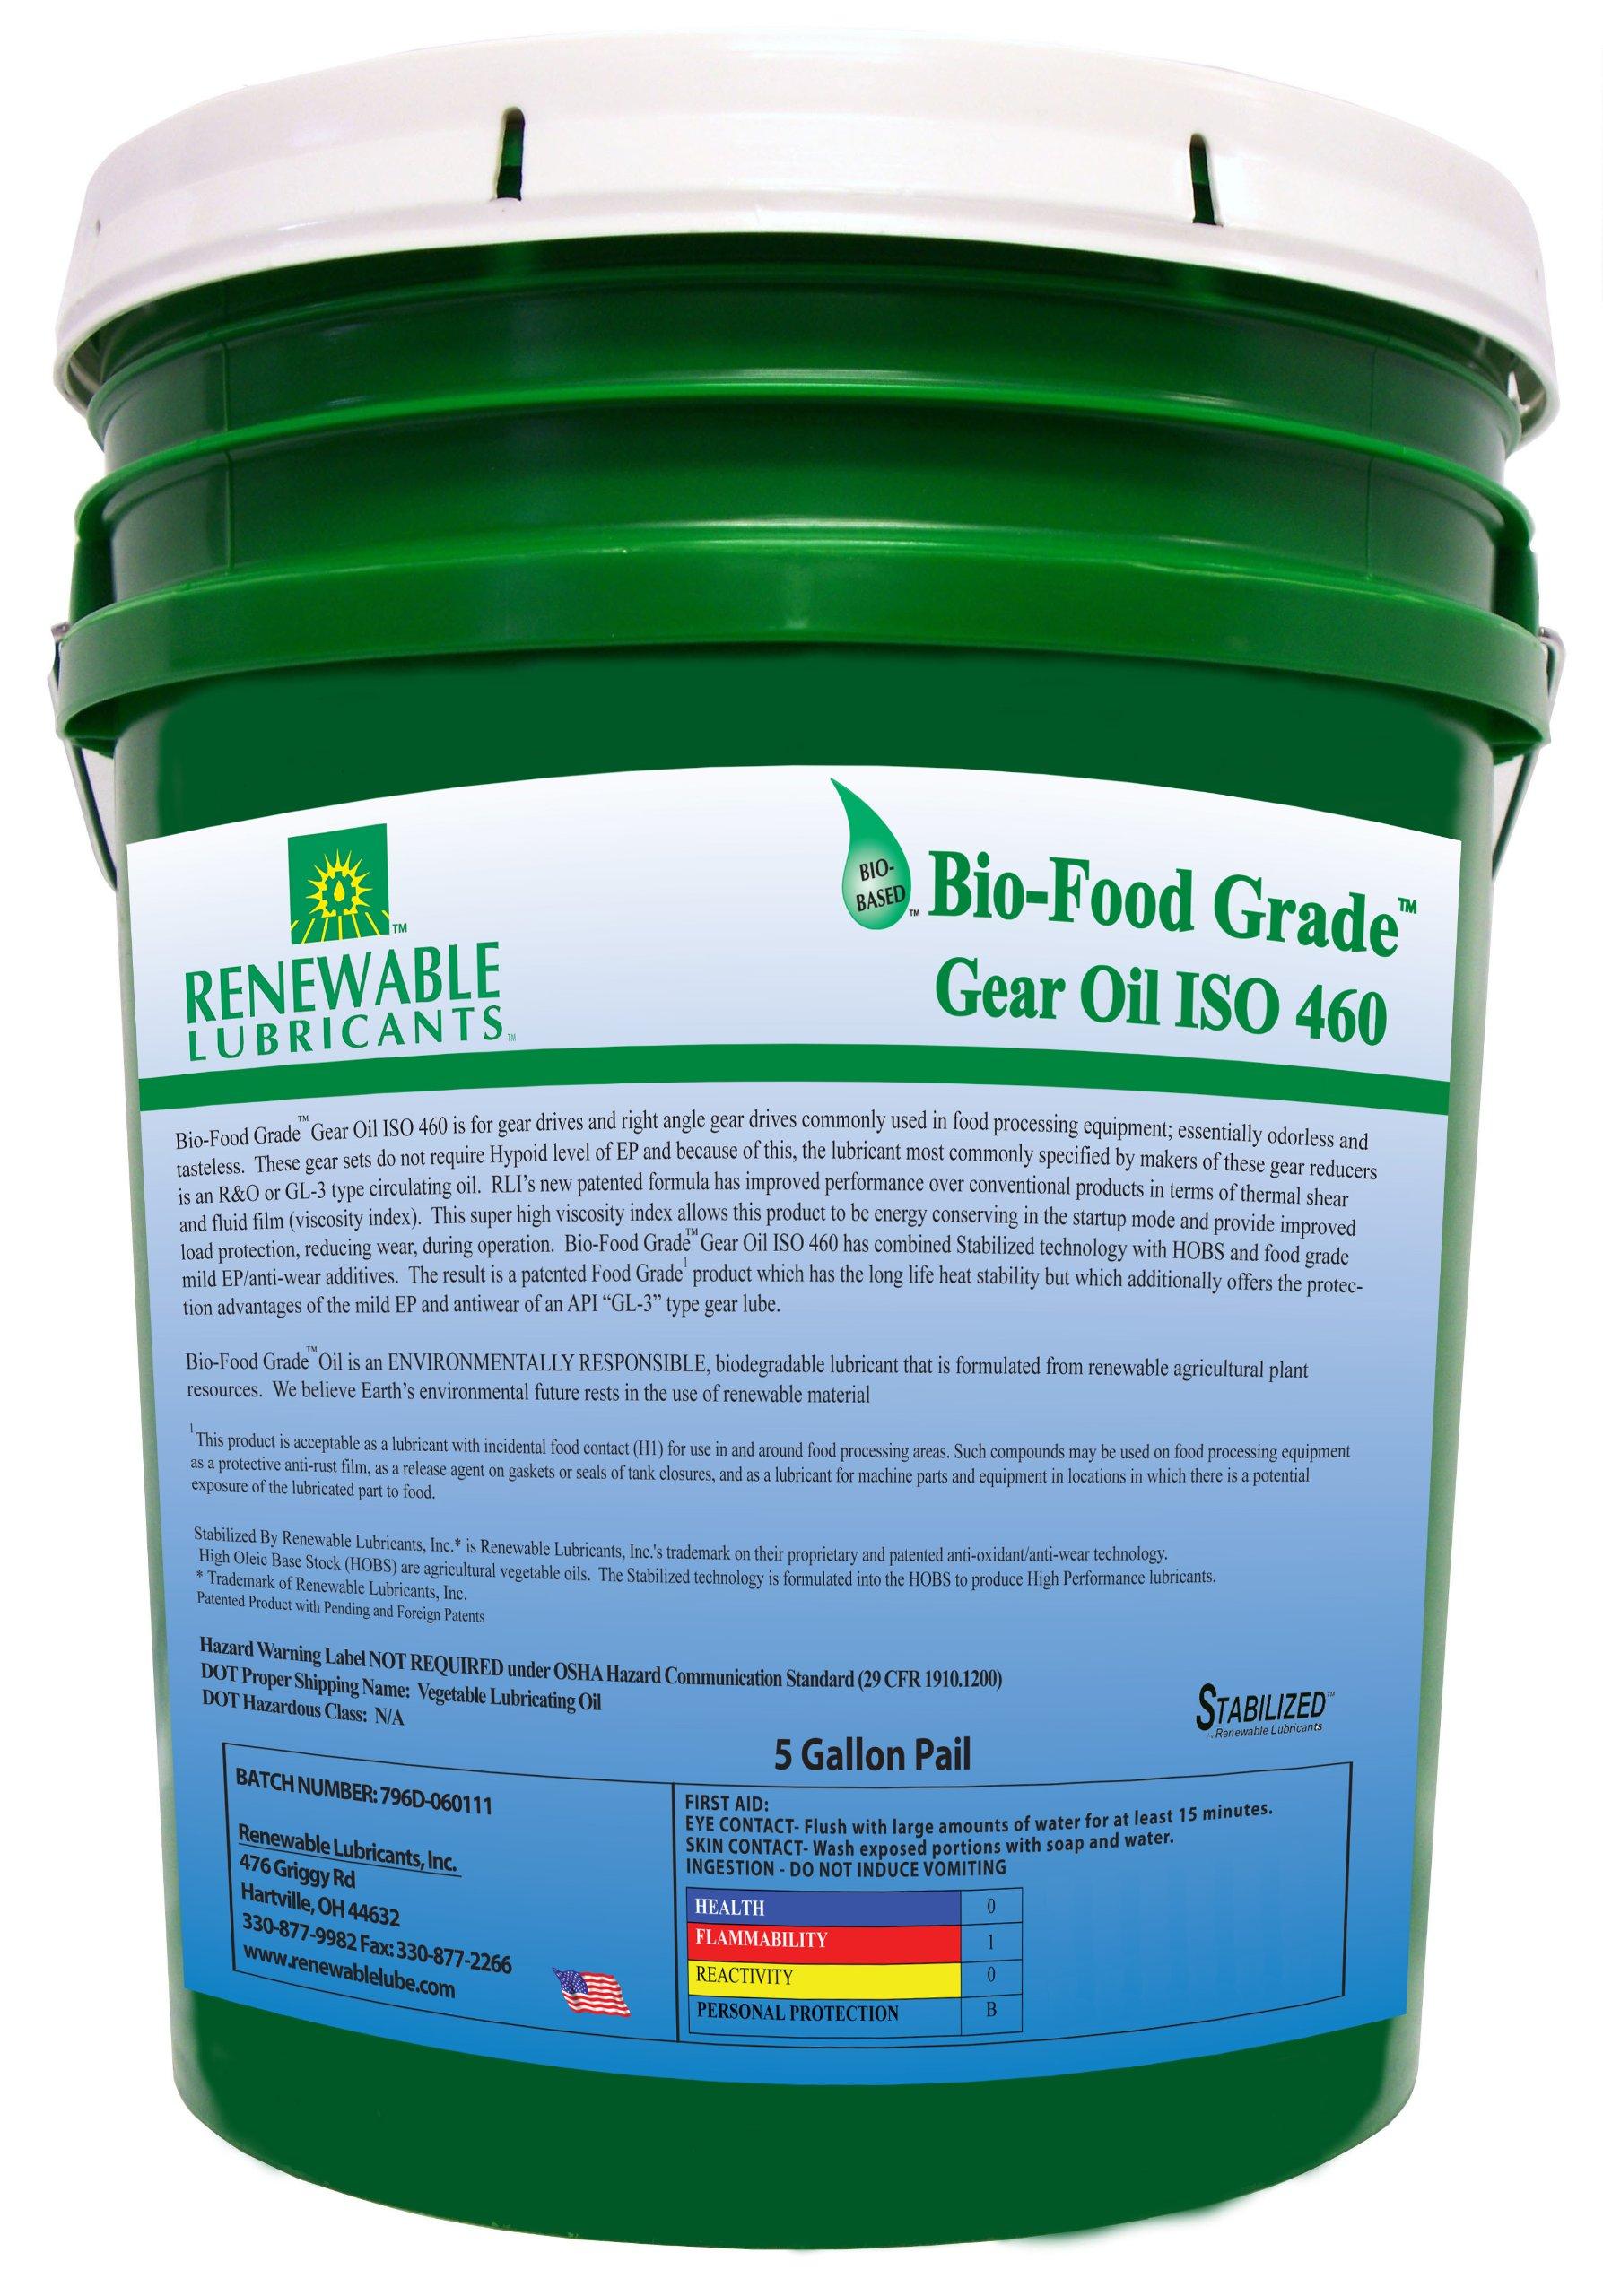 Renewable Lubricants Bio-Food Grade ISO 460 Gear Oil, 5 Gallon Pail